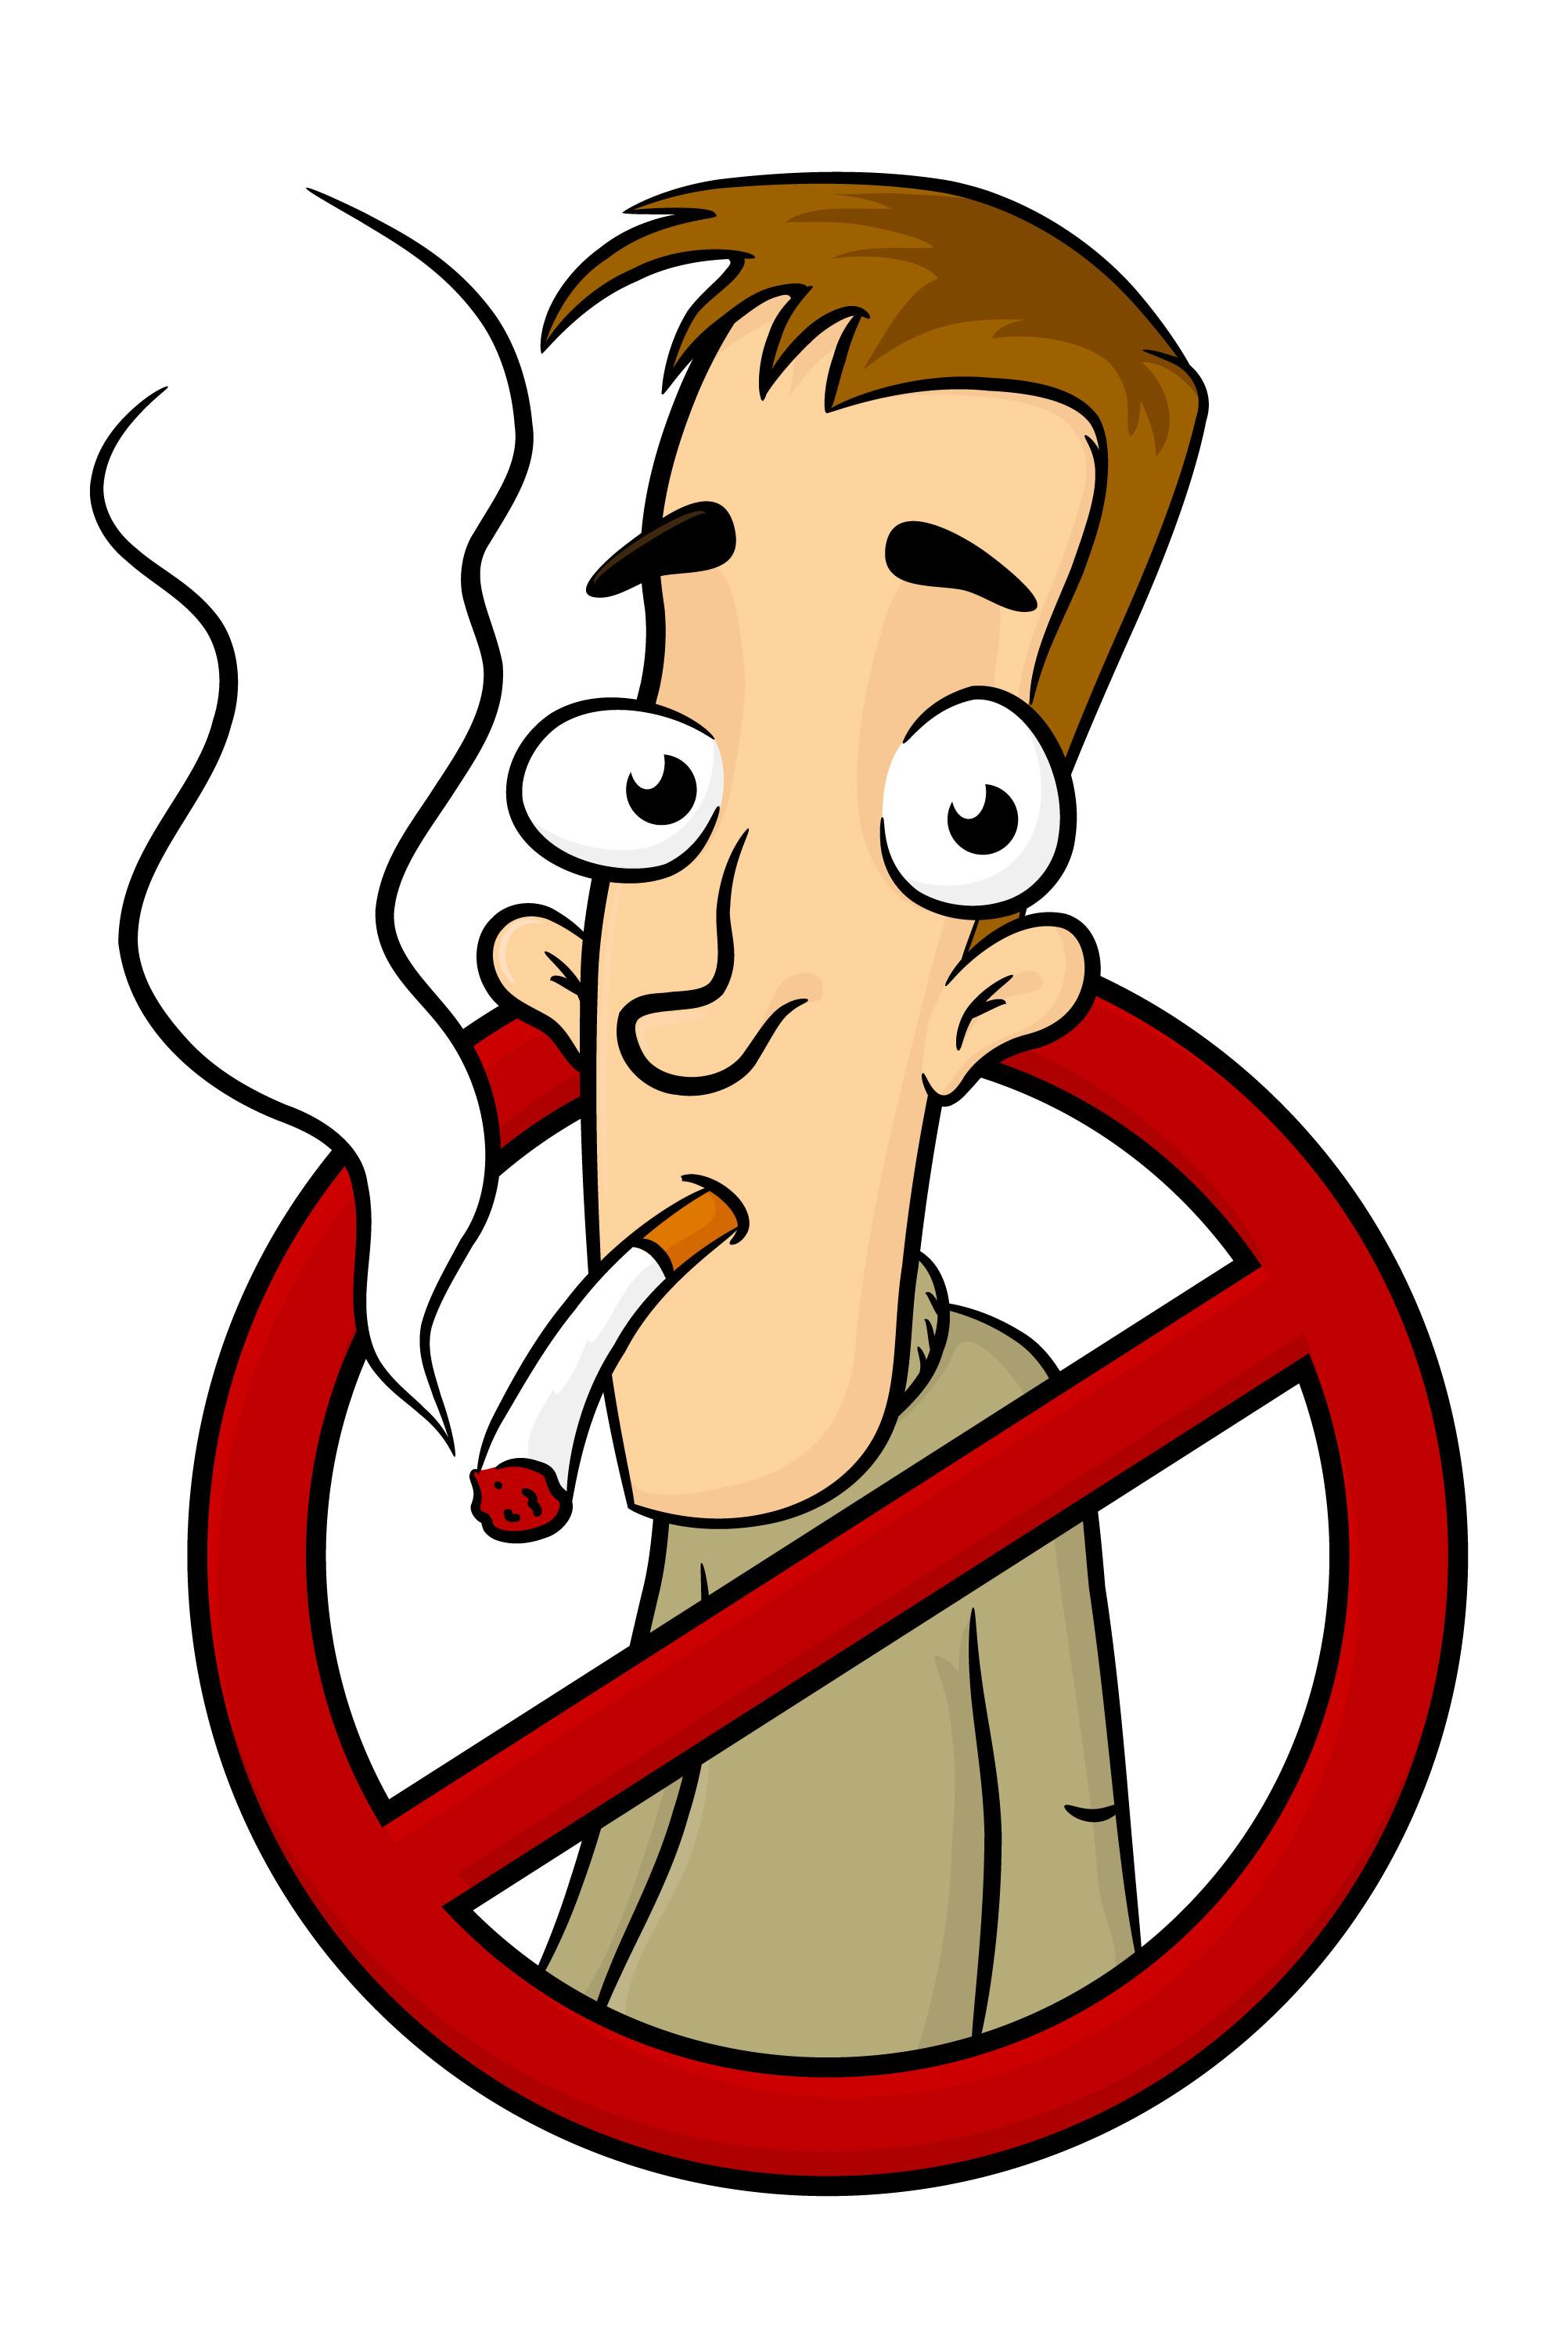 No Smoking clipart quit smoking Ilitlamra's soup